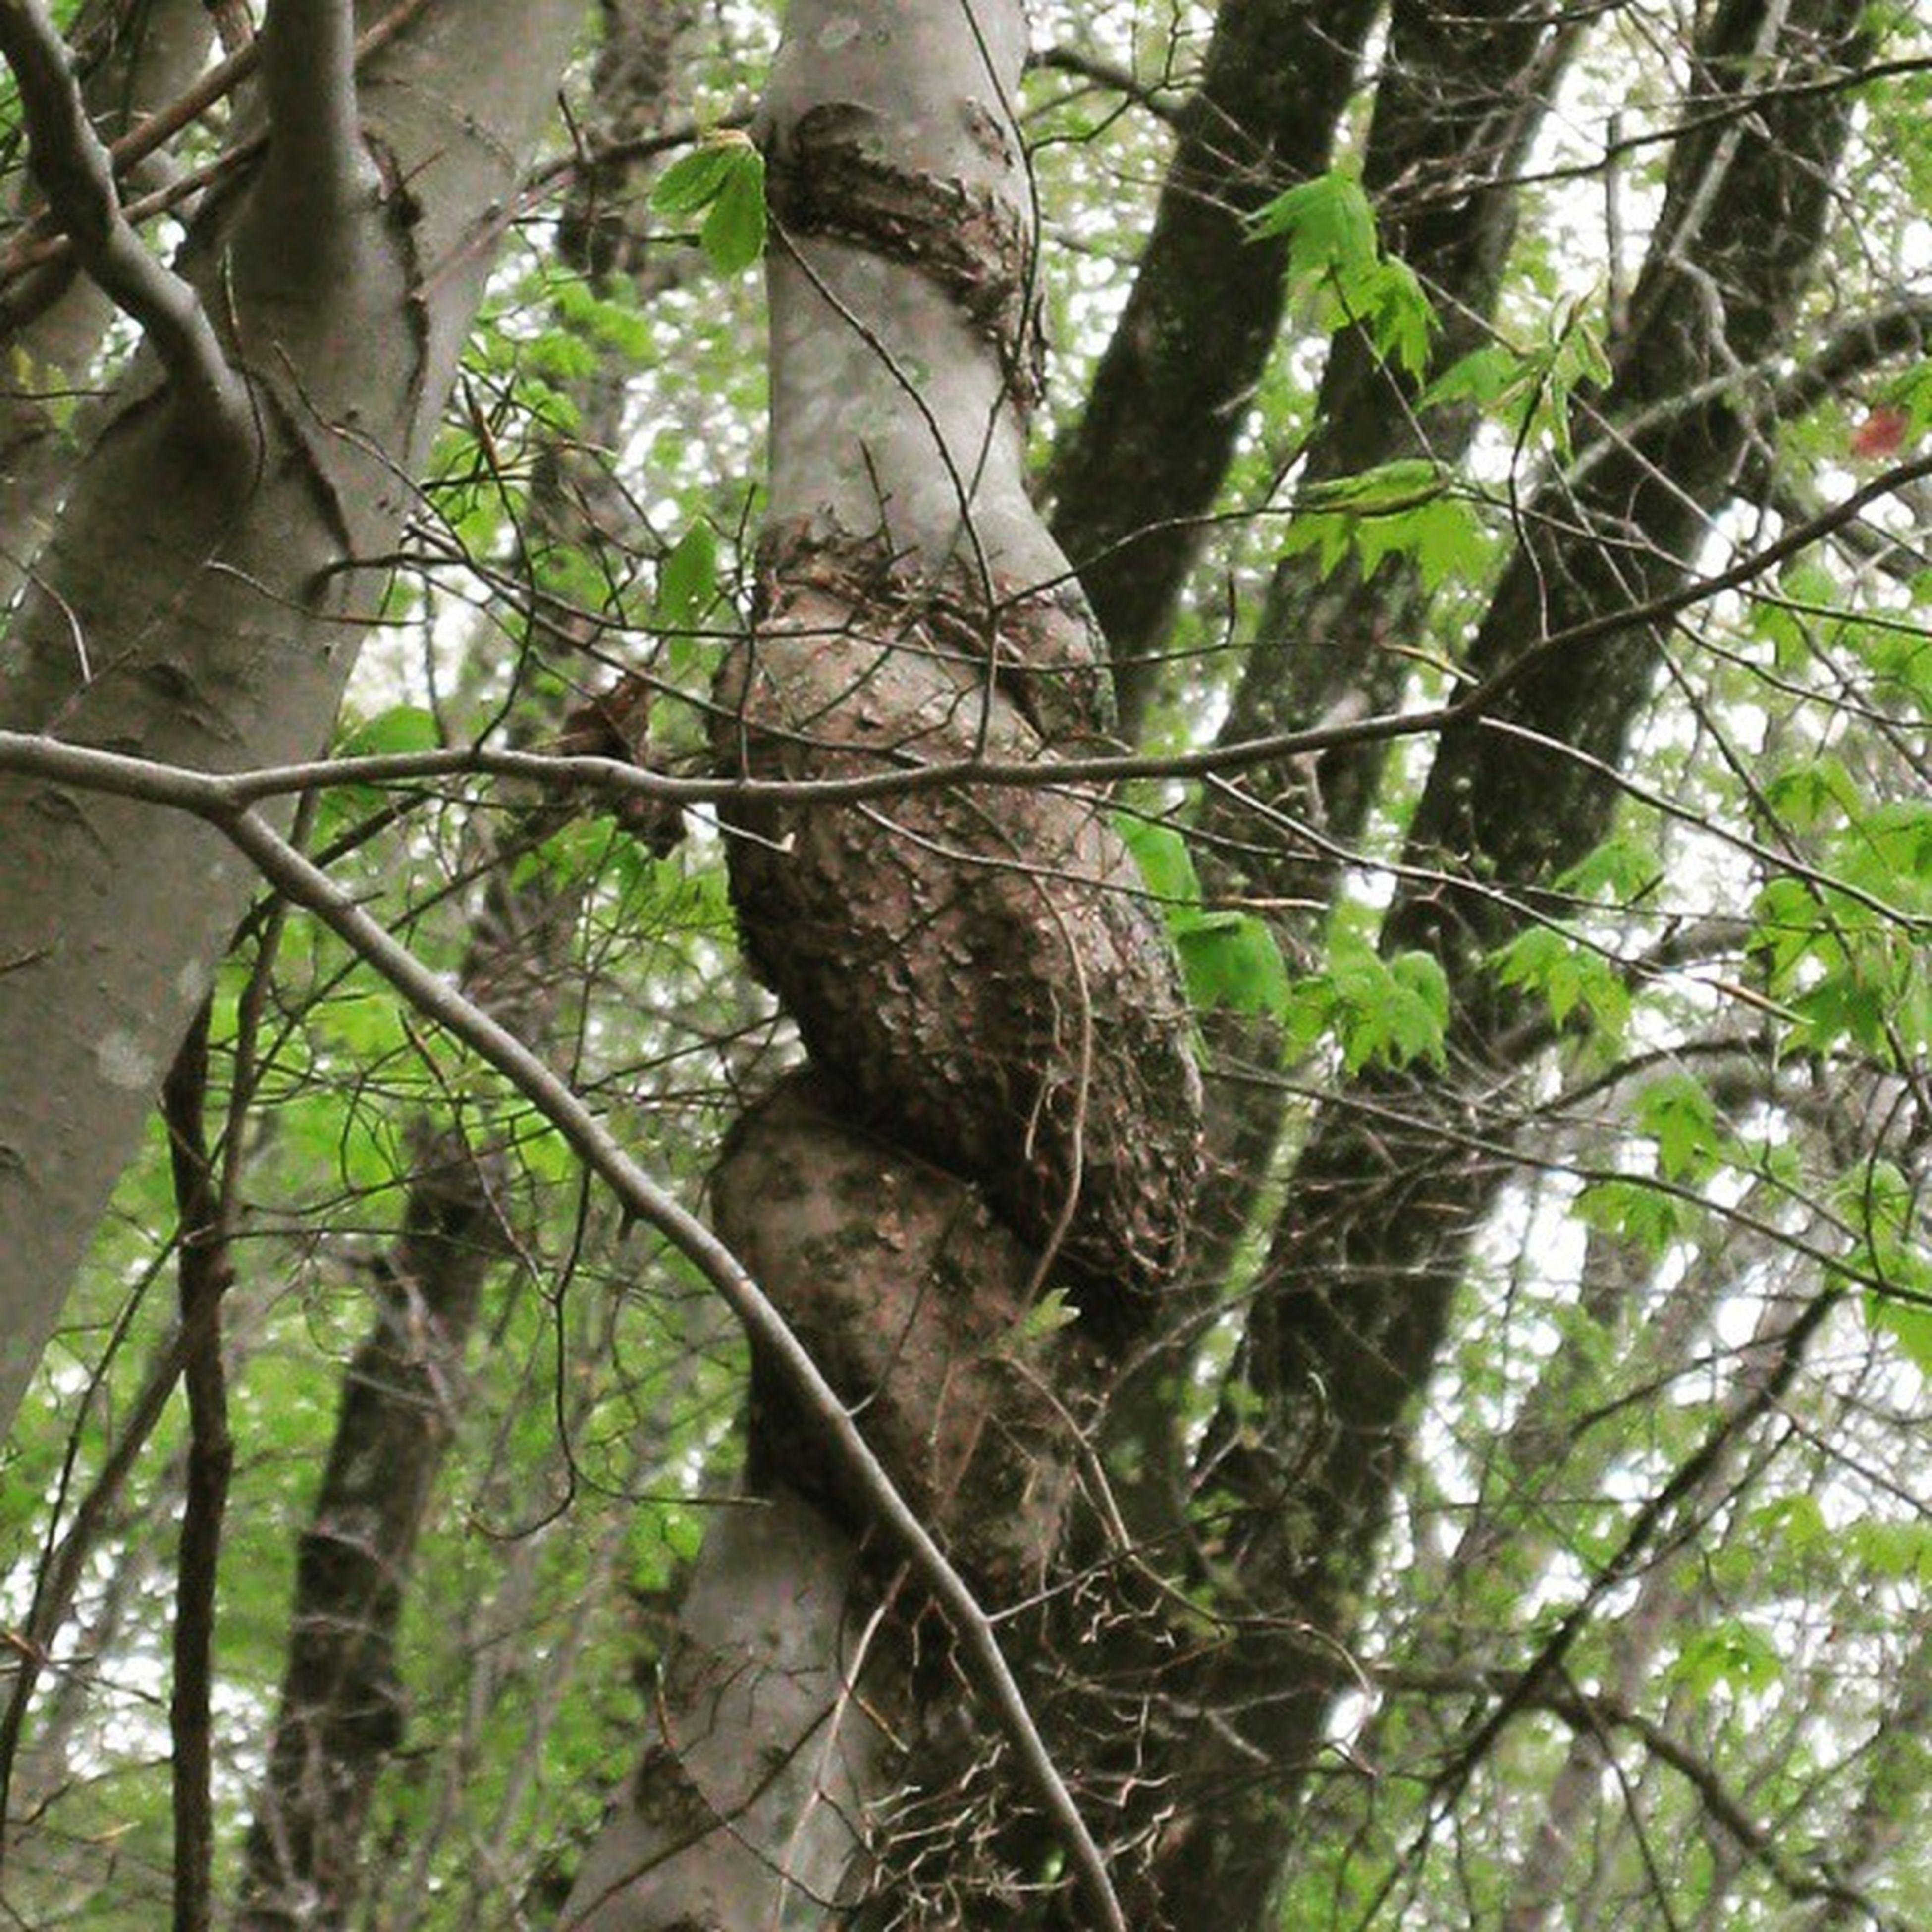 Twistytree Forest Exploring Natureaddict gooutside outdoorlovers tree_captures bestnatureshot igers_of_wv wv_igers wv_nature westvirginia natureonly love_natura